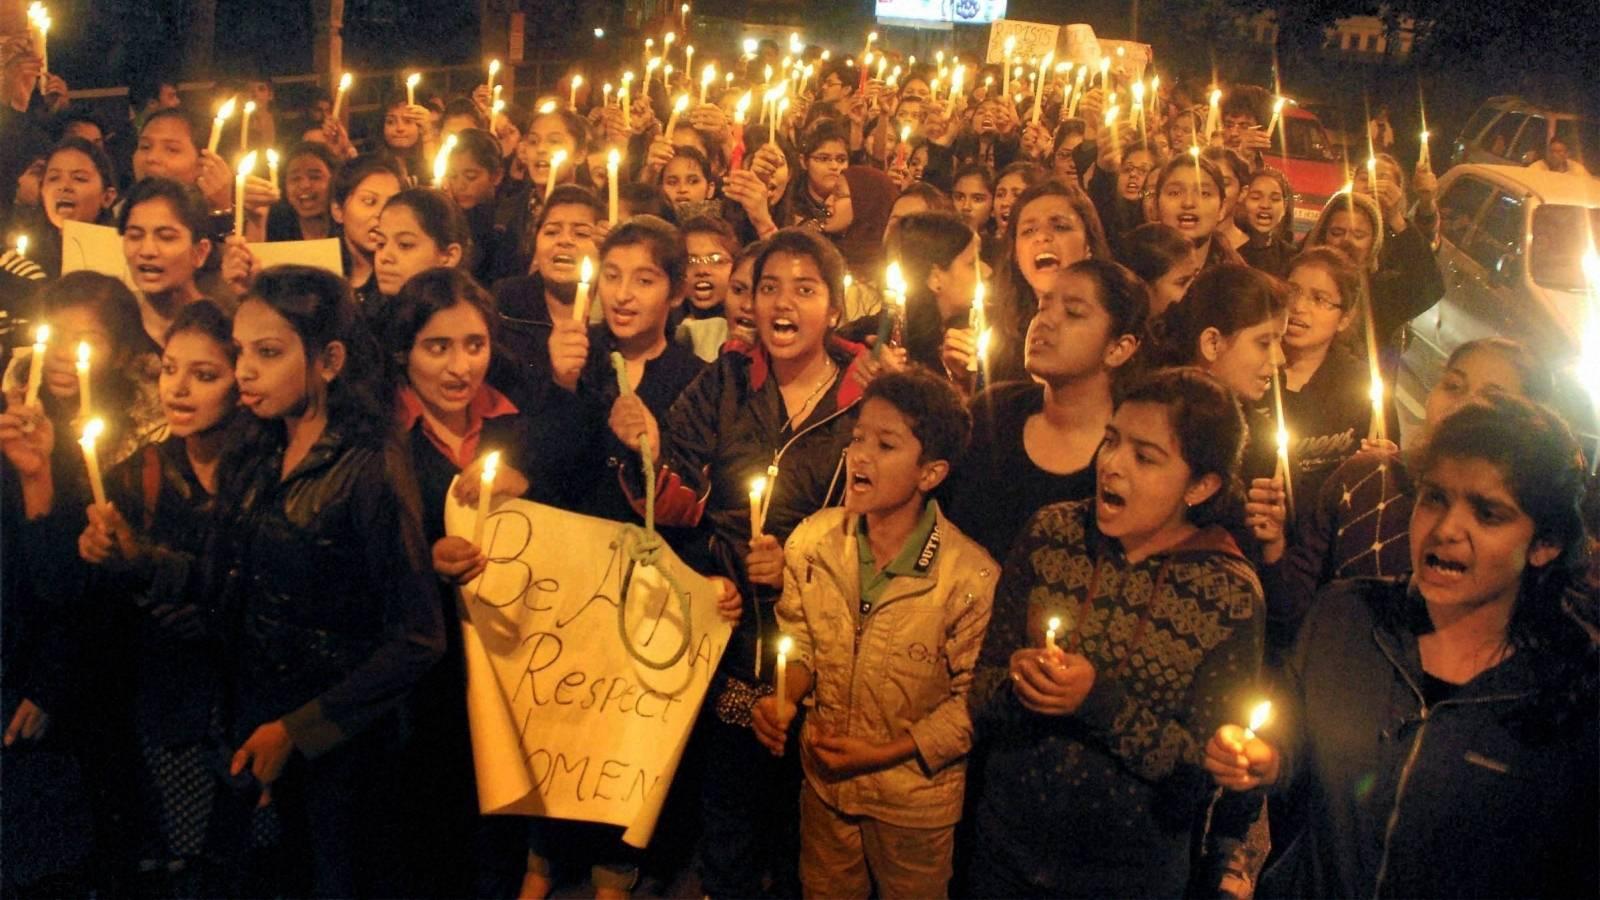 India asks YouTube to remove Delhi rape film